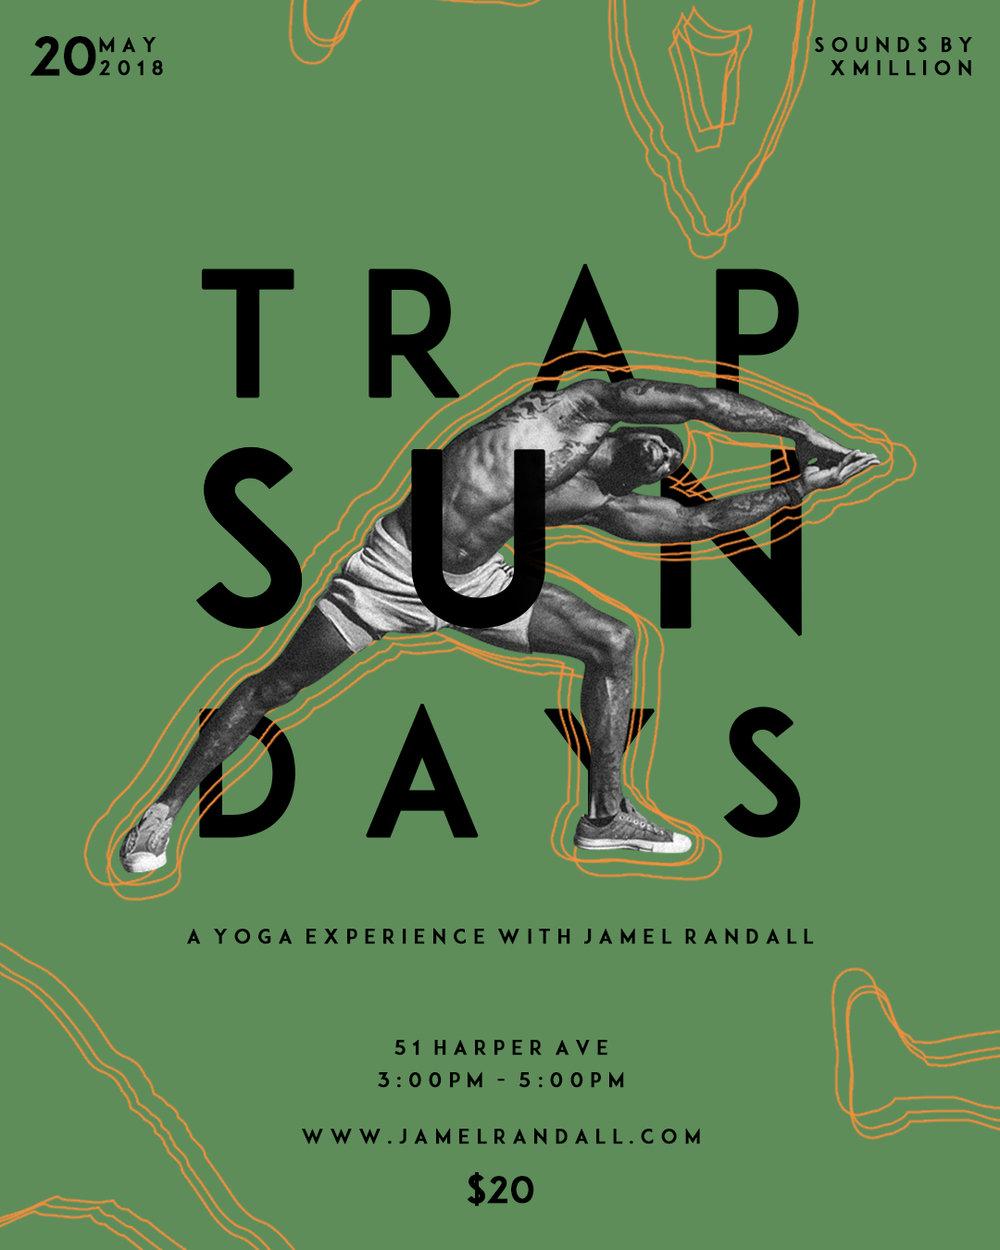 Trap Sundays Detroit - Jamel Randall